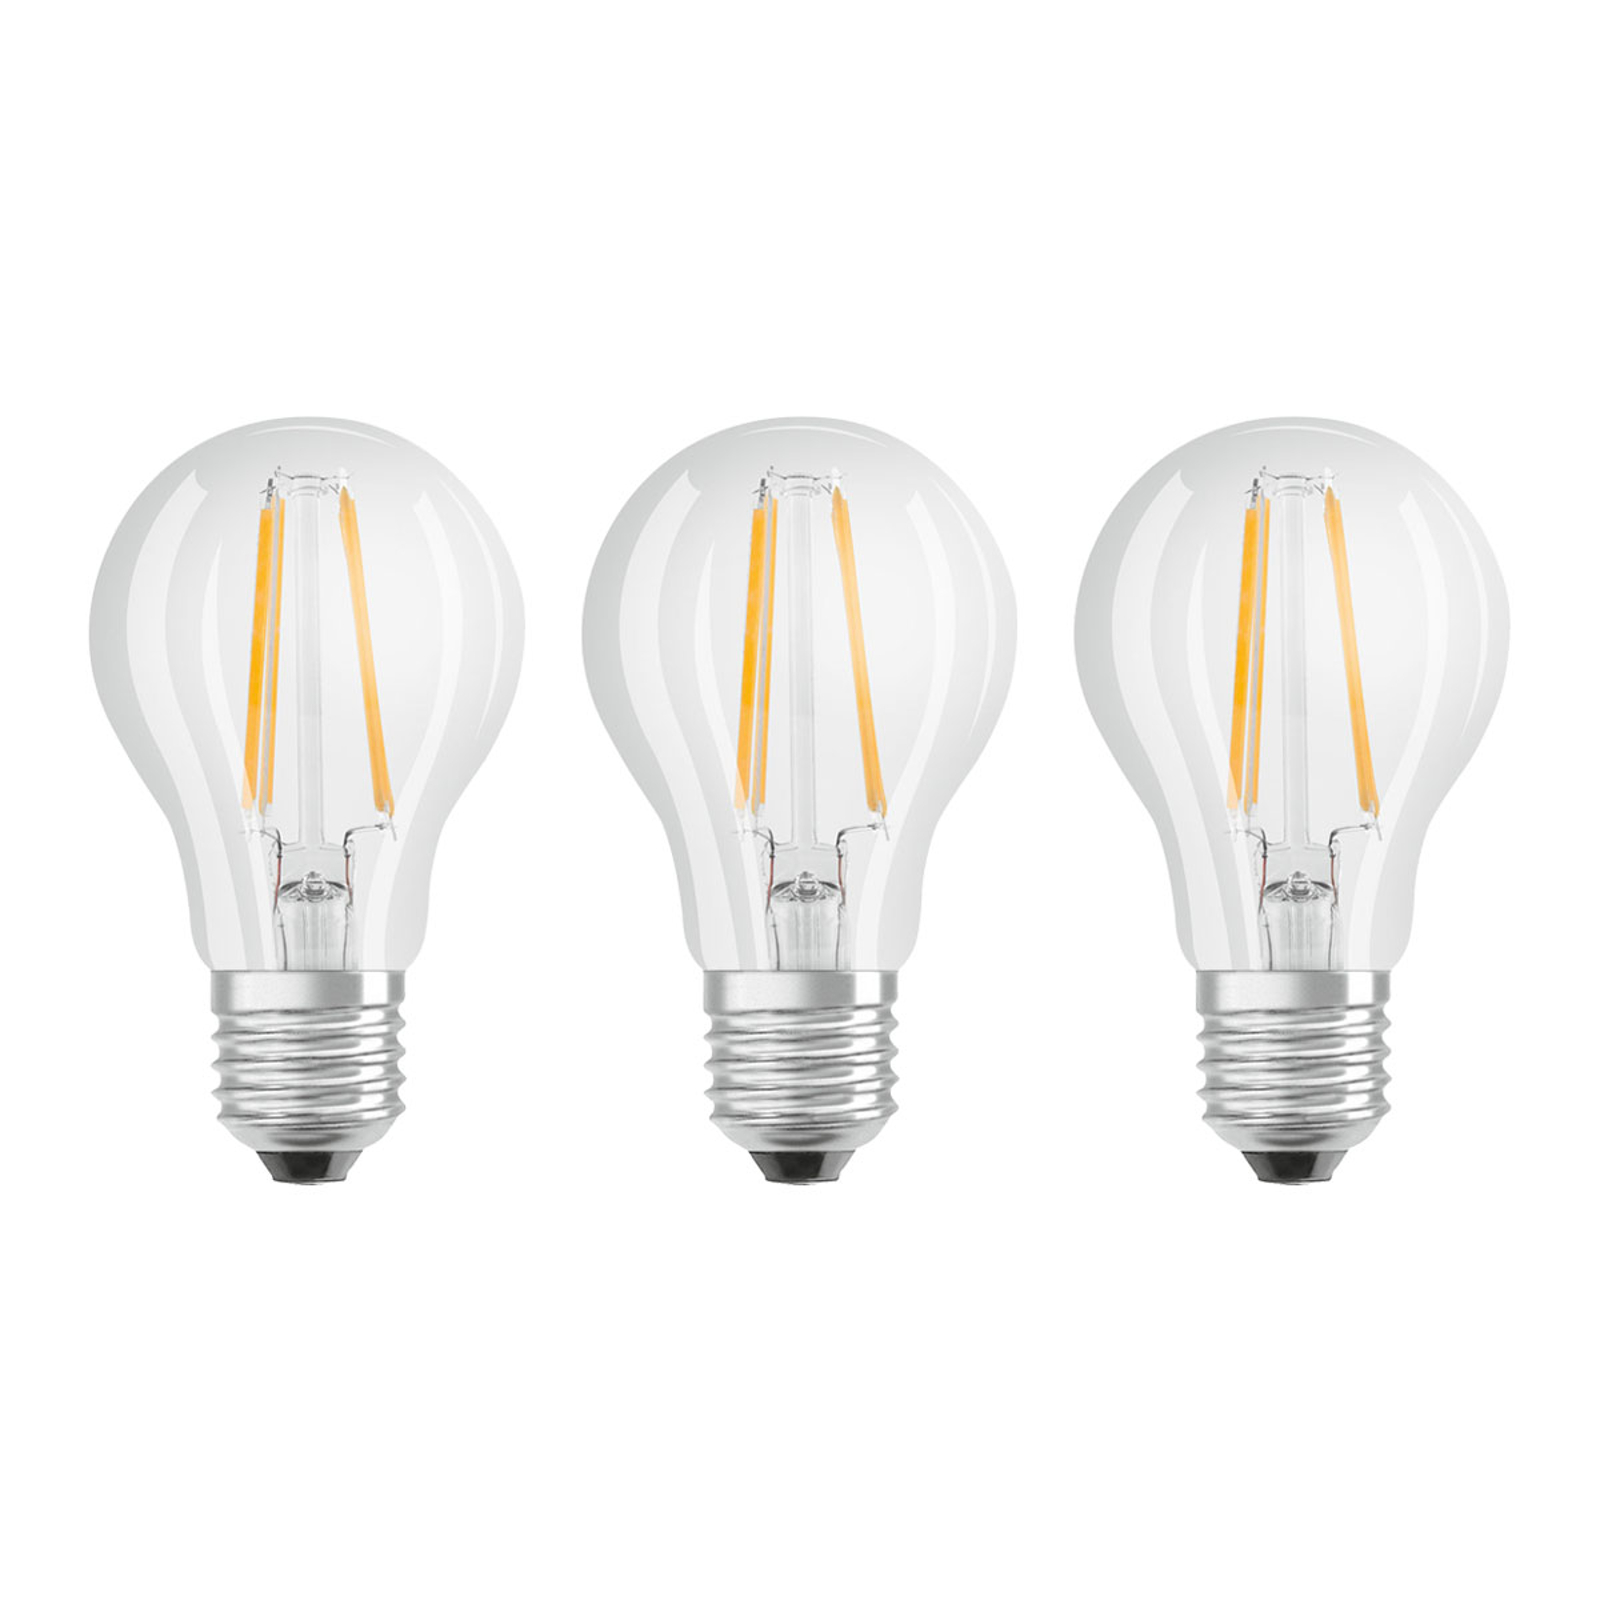 OSRAM-LED-lamppu E27 Classic Fil. 840 6,5W 3 kpl